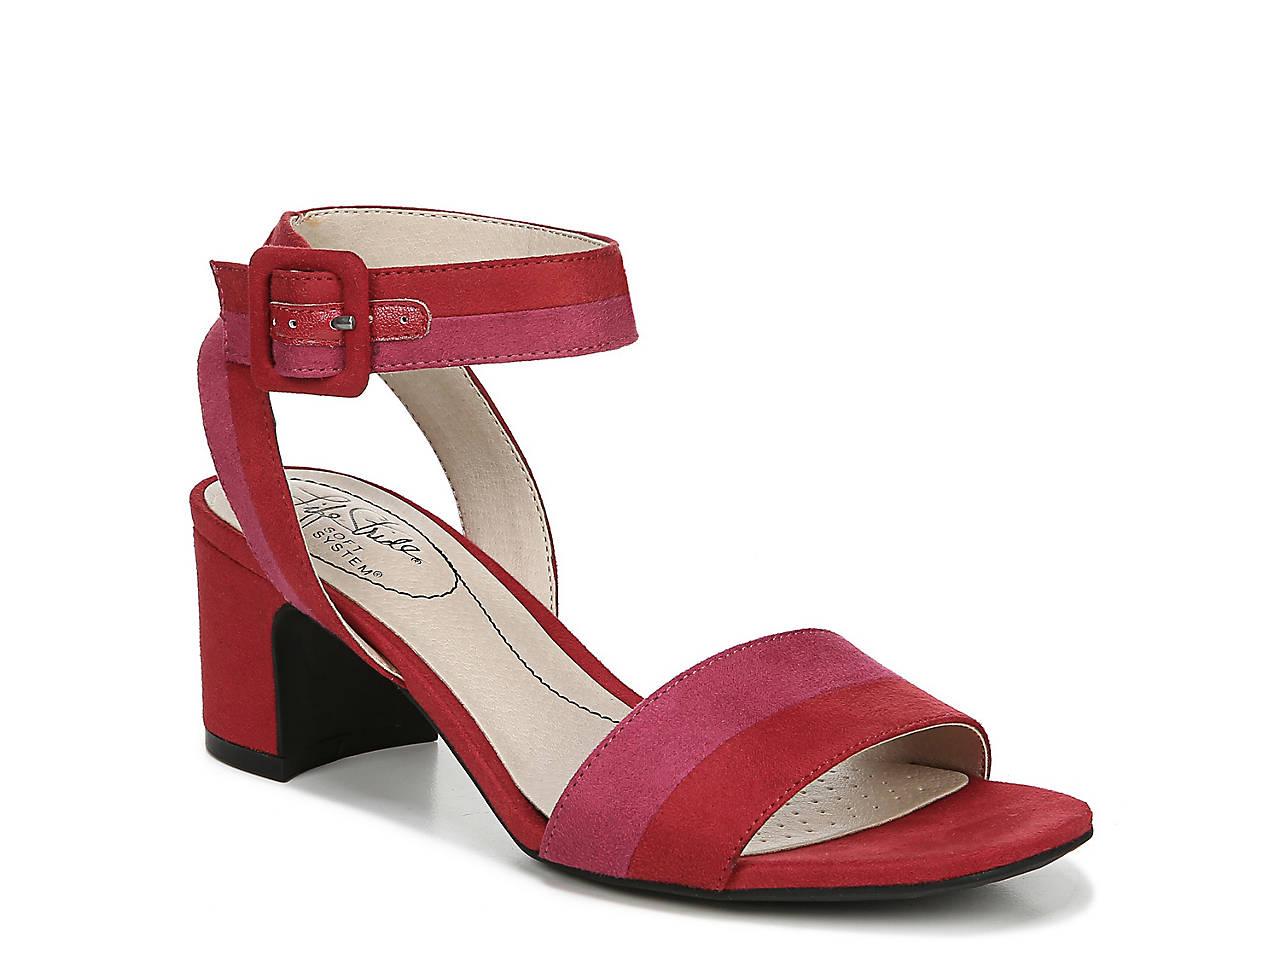 9289b6931ef7 LifeStride Carnival Sandal Women s Shoes